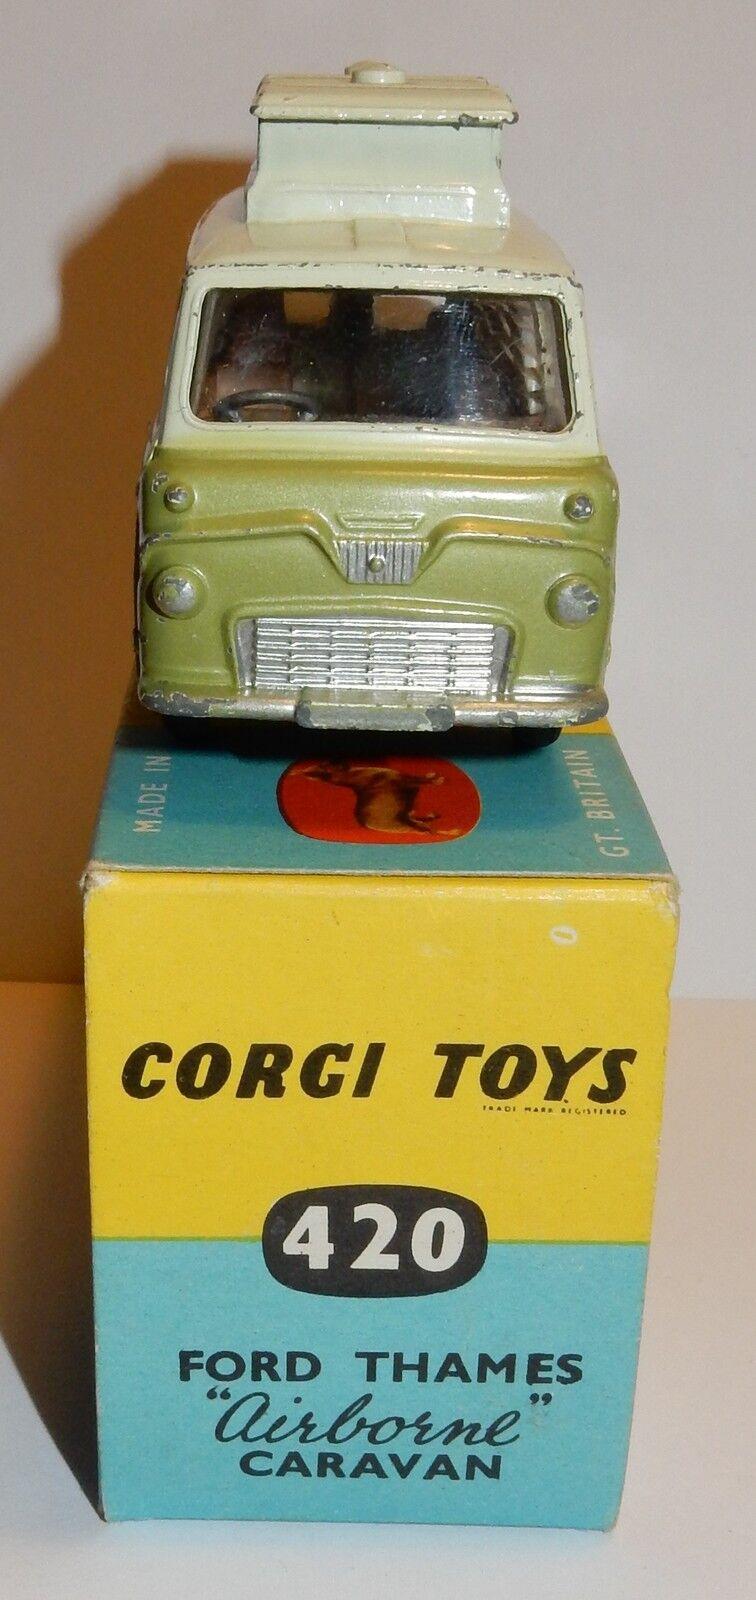 RARE CORGI TOYS THAMES FORD THAMES TOYS AIRBONE CARAVAN VERT 2 TONS 1962 1/43 REF 420 IN BOX 47f46d